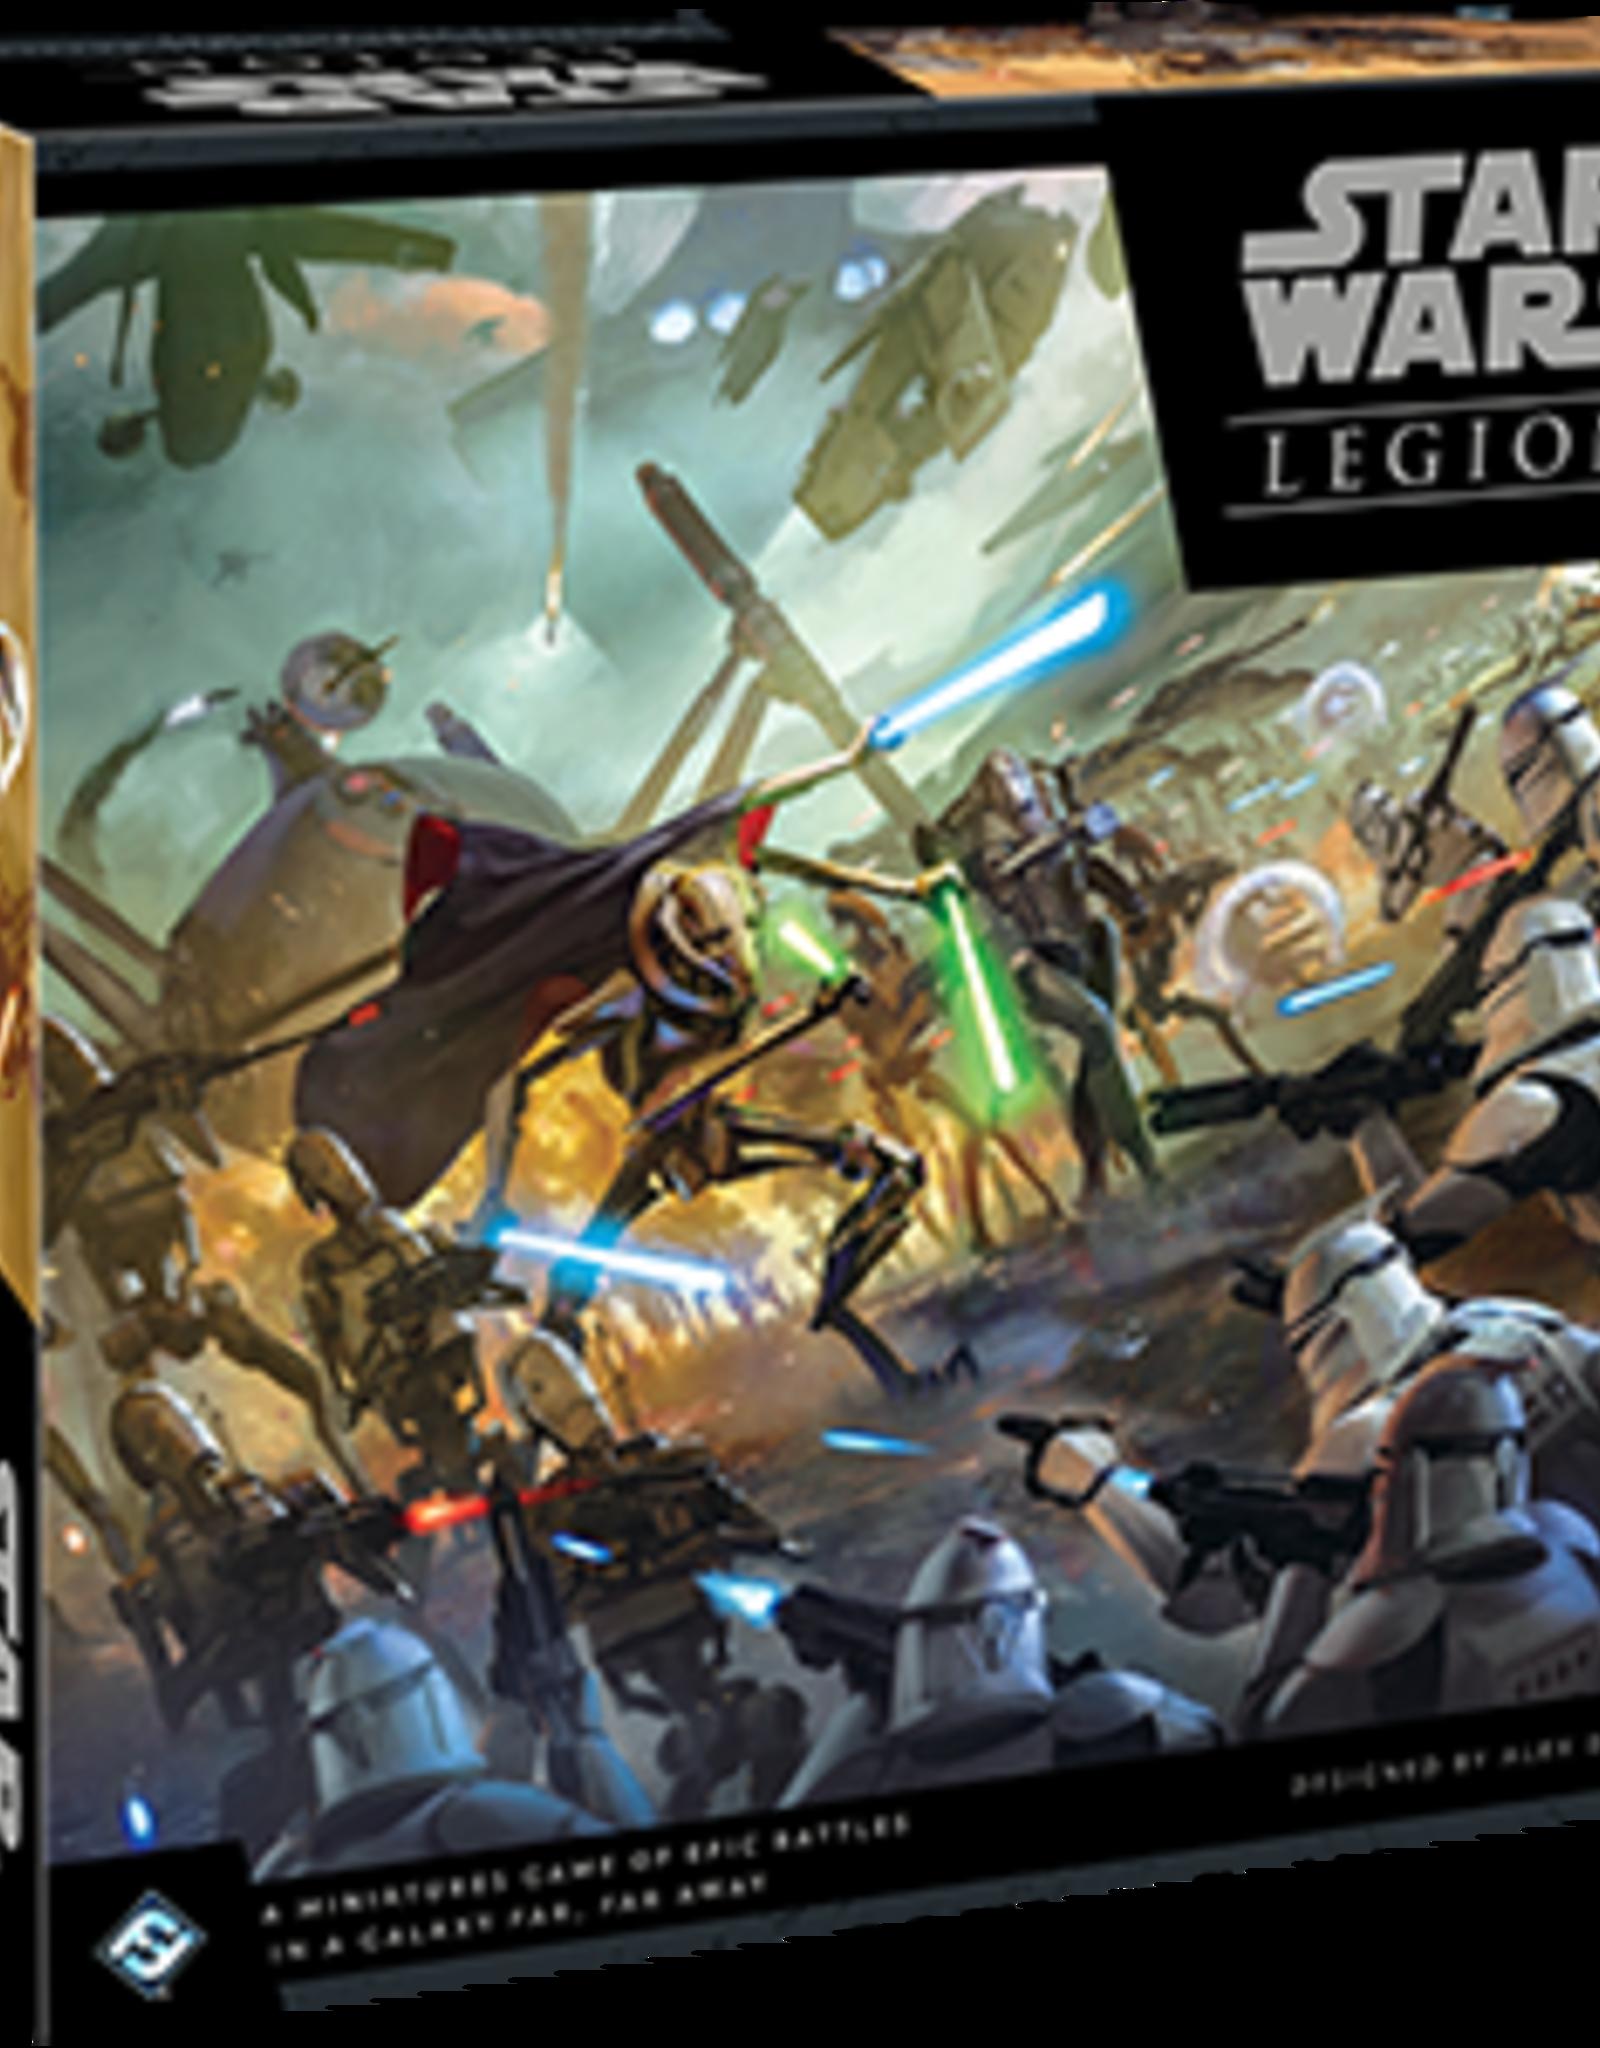 FFG Star Wars Legion: Clone Wars Core Set